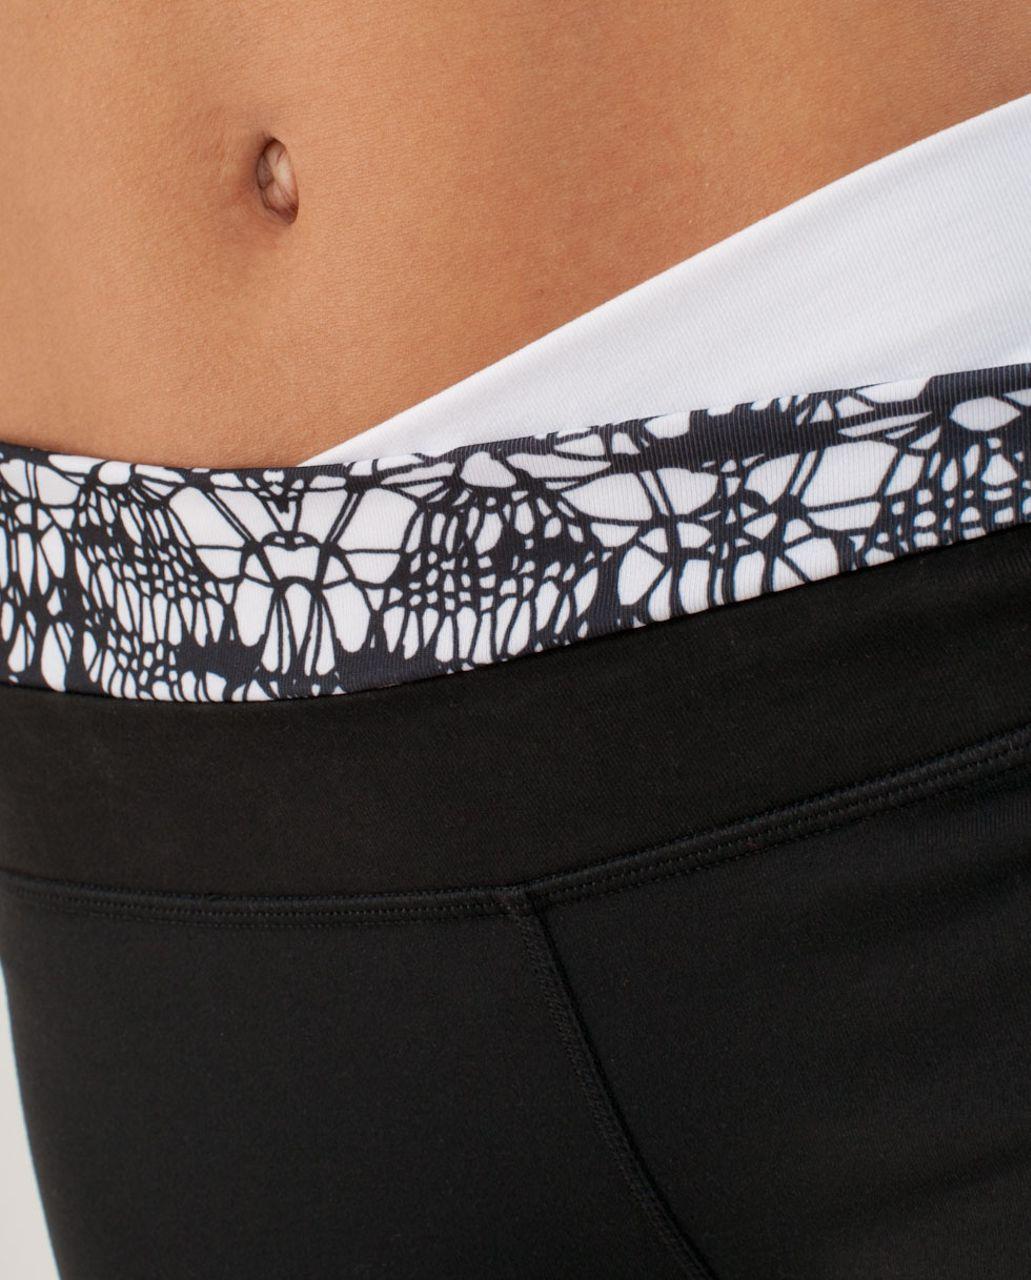 Lululemon Astro Pant (Regular) - Black /  Black Glacier Lace Embossed /  White Black Glacier Lace